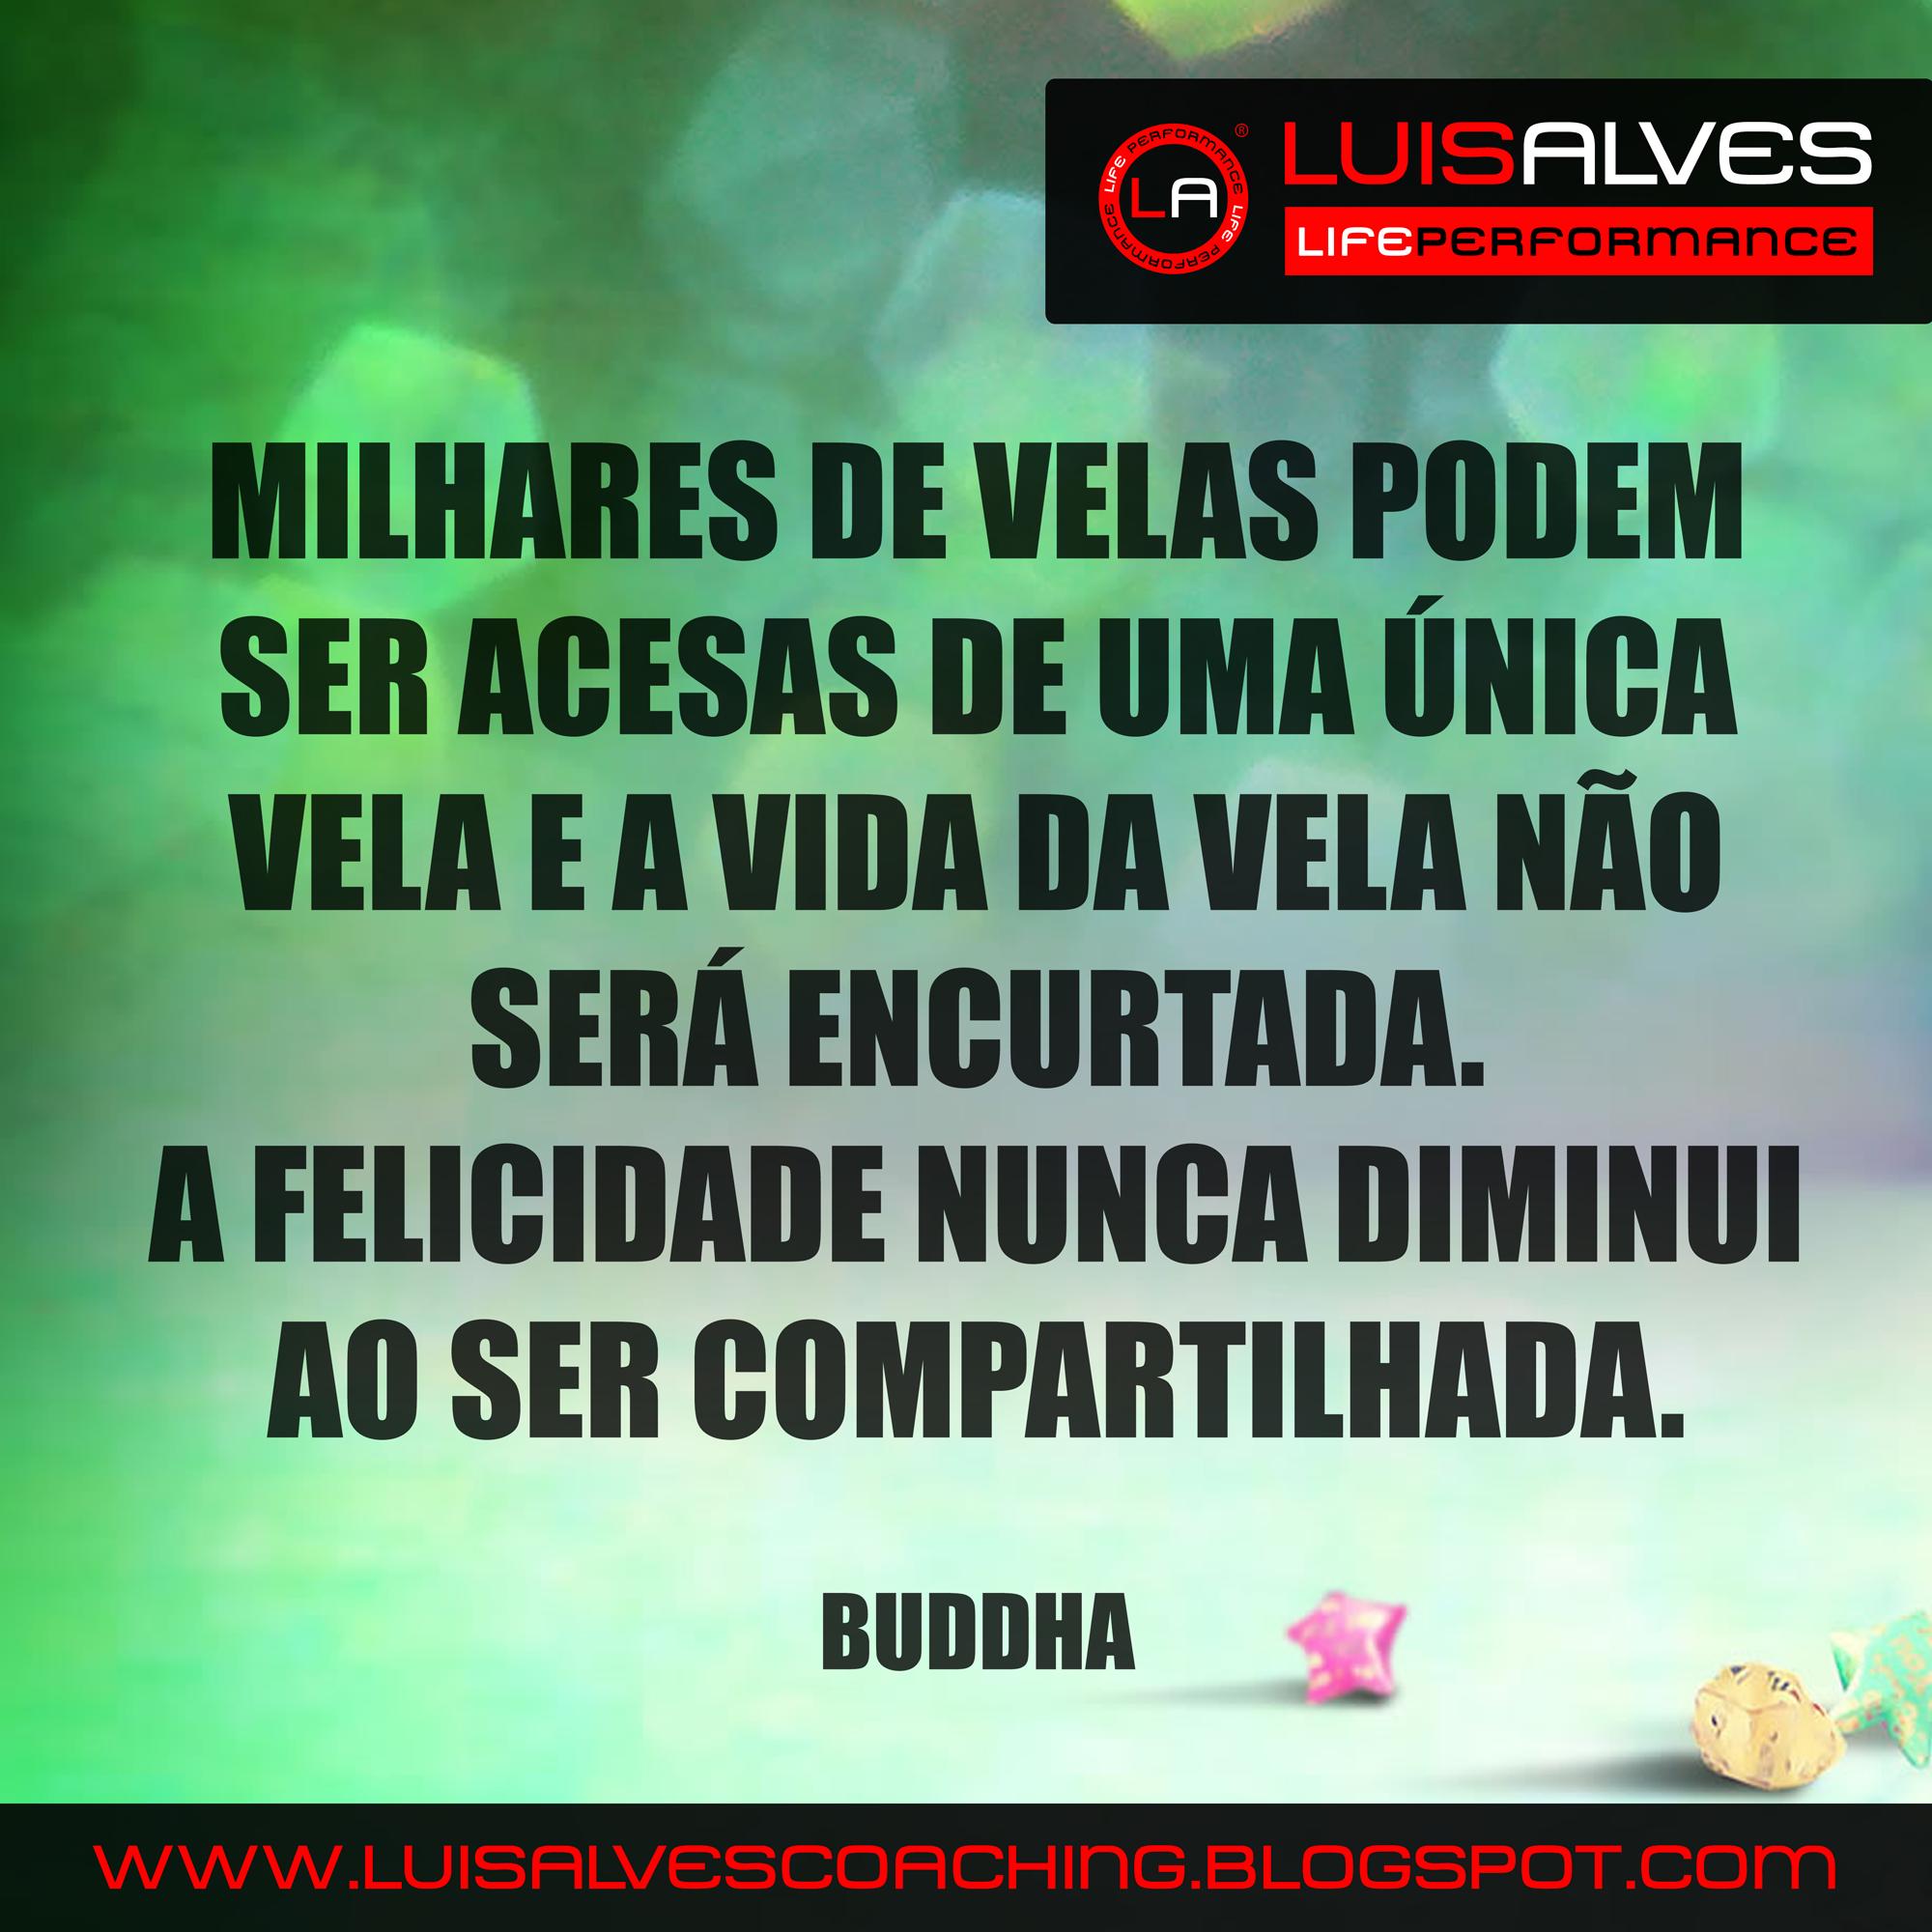 "PENSAMENTO DO DIA Curta, Comente e Partilhe.  ""SEM LIMITES"" [Novo Livro]  Amazon (Brasil) - http://goo.gl/detYjf Amazon (Internacional) - http://goo.gl/o7VxtI Google Play - https://goo.gl/yZx8UC iTunes / iBooks - https://goo.gl/CWtHb9 Kobo - https://goo.gl/BmIvd2"